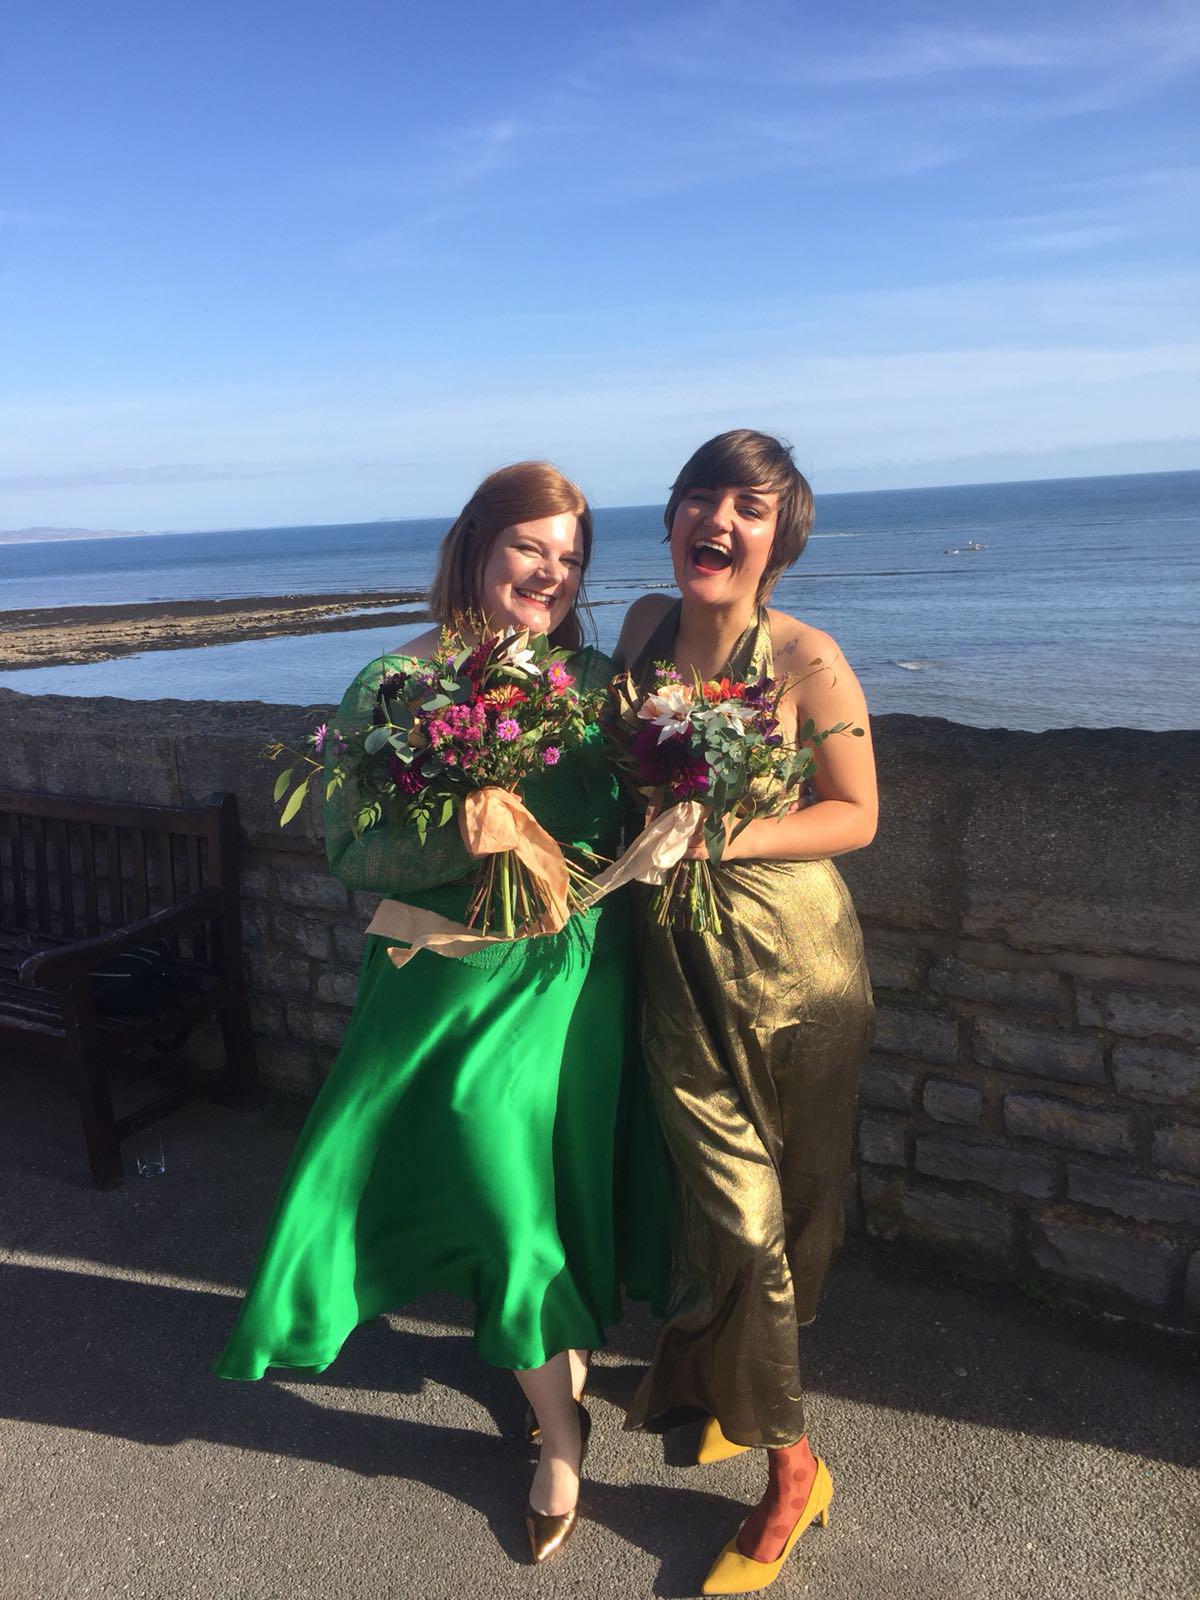 Lucy-Bespoke-Green-Silk-Lace-Wedding-Dress-Kate-Beaumont-Sheffield-a-8.jpg